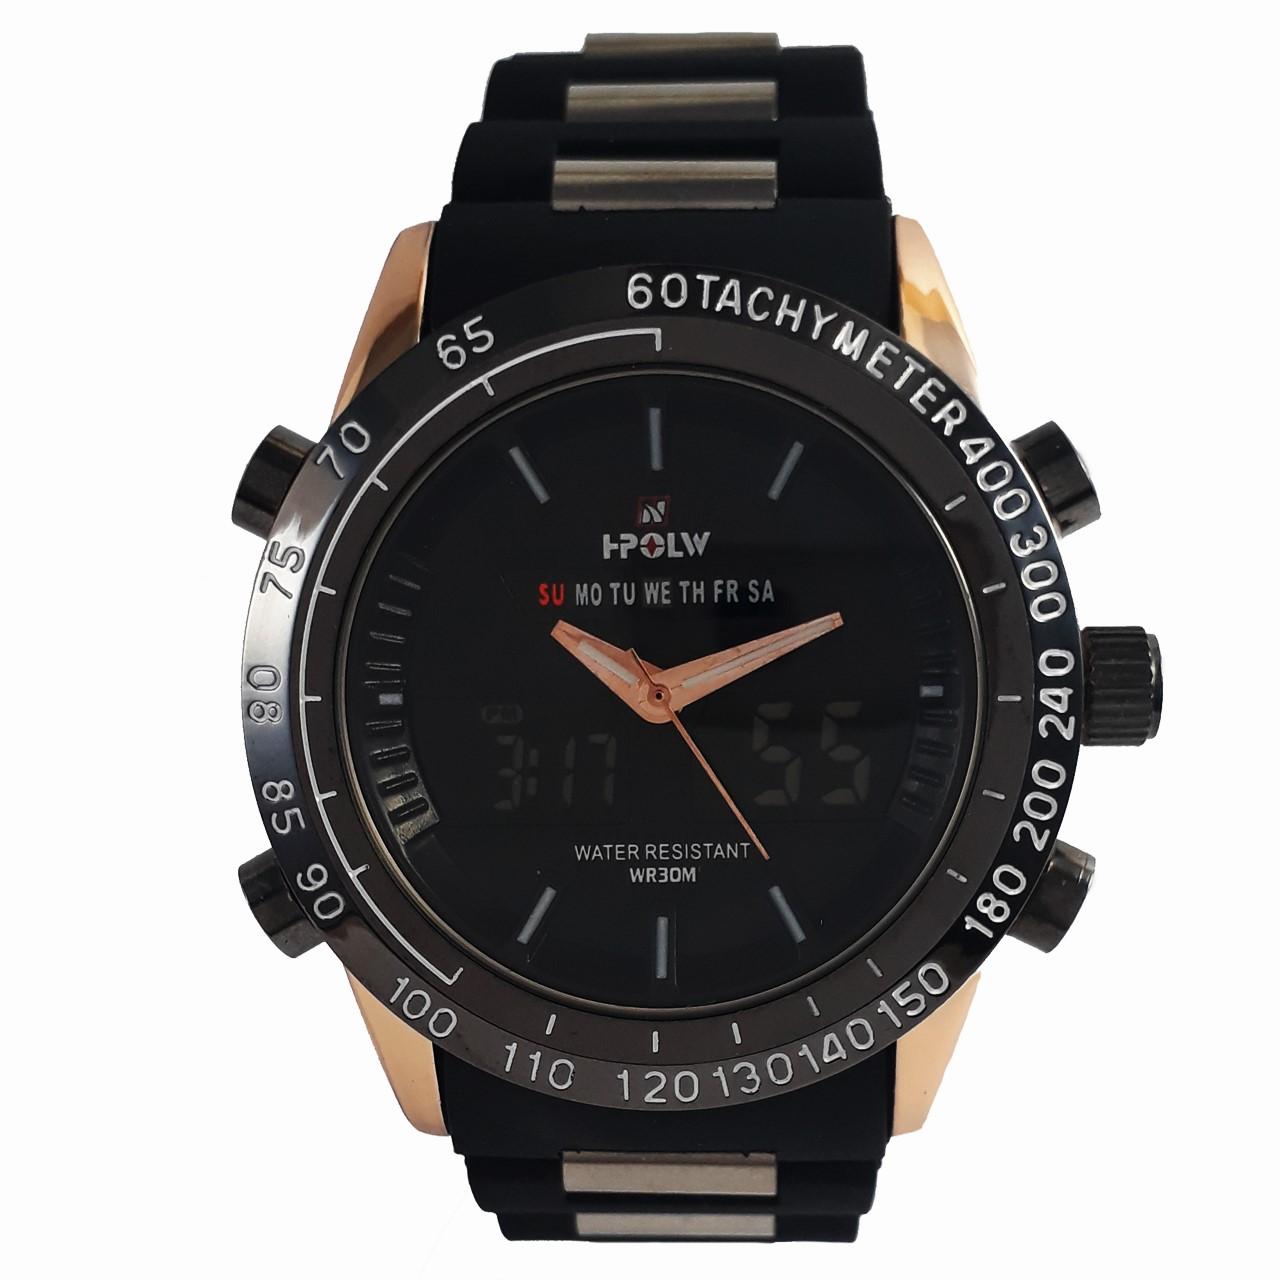 ساعت مچی عقربه ای مردانه اچ-پولو مدل FS1519